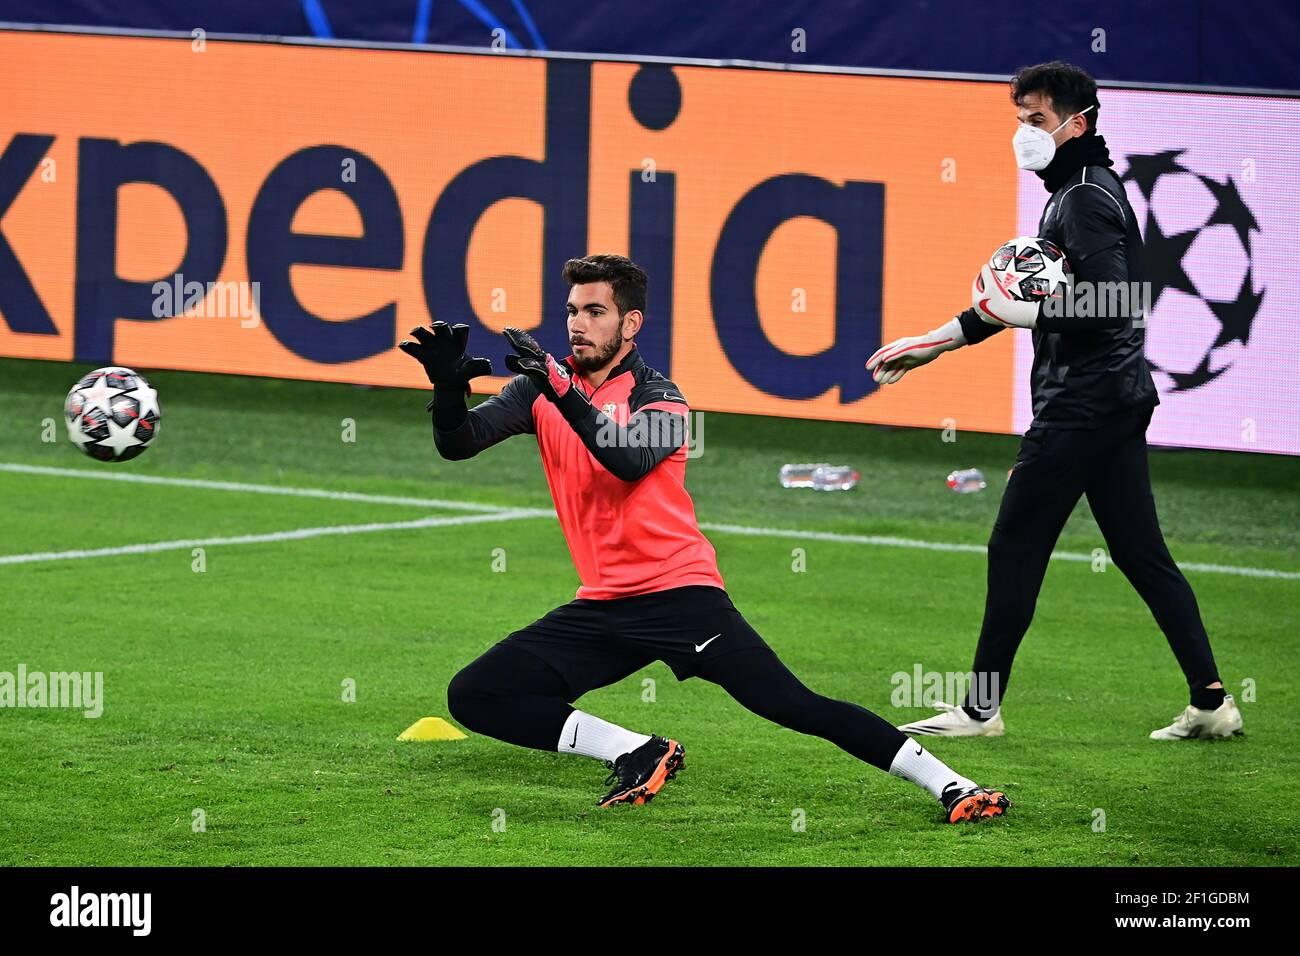 Goalkeeper Borussia Dortmund Immagini e Fotos Stock - Alamy